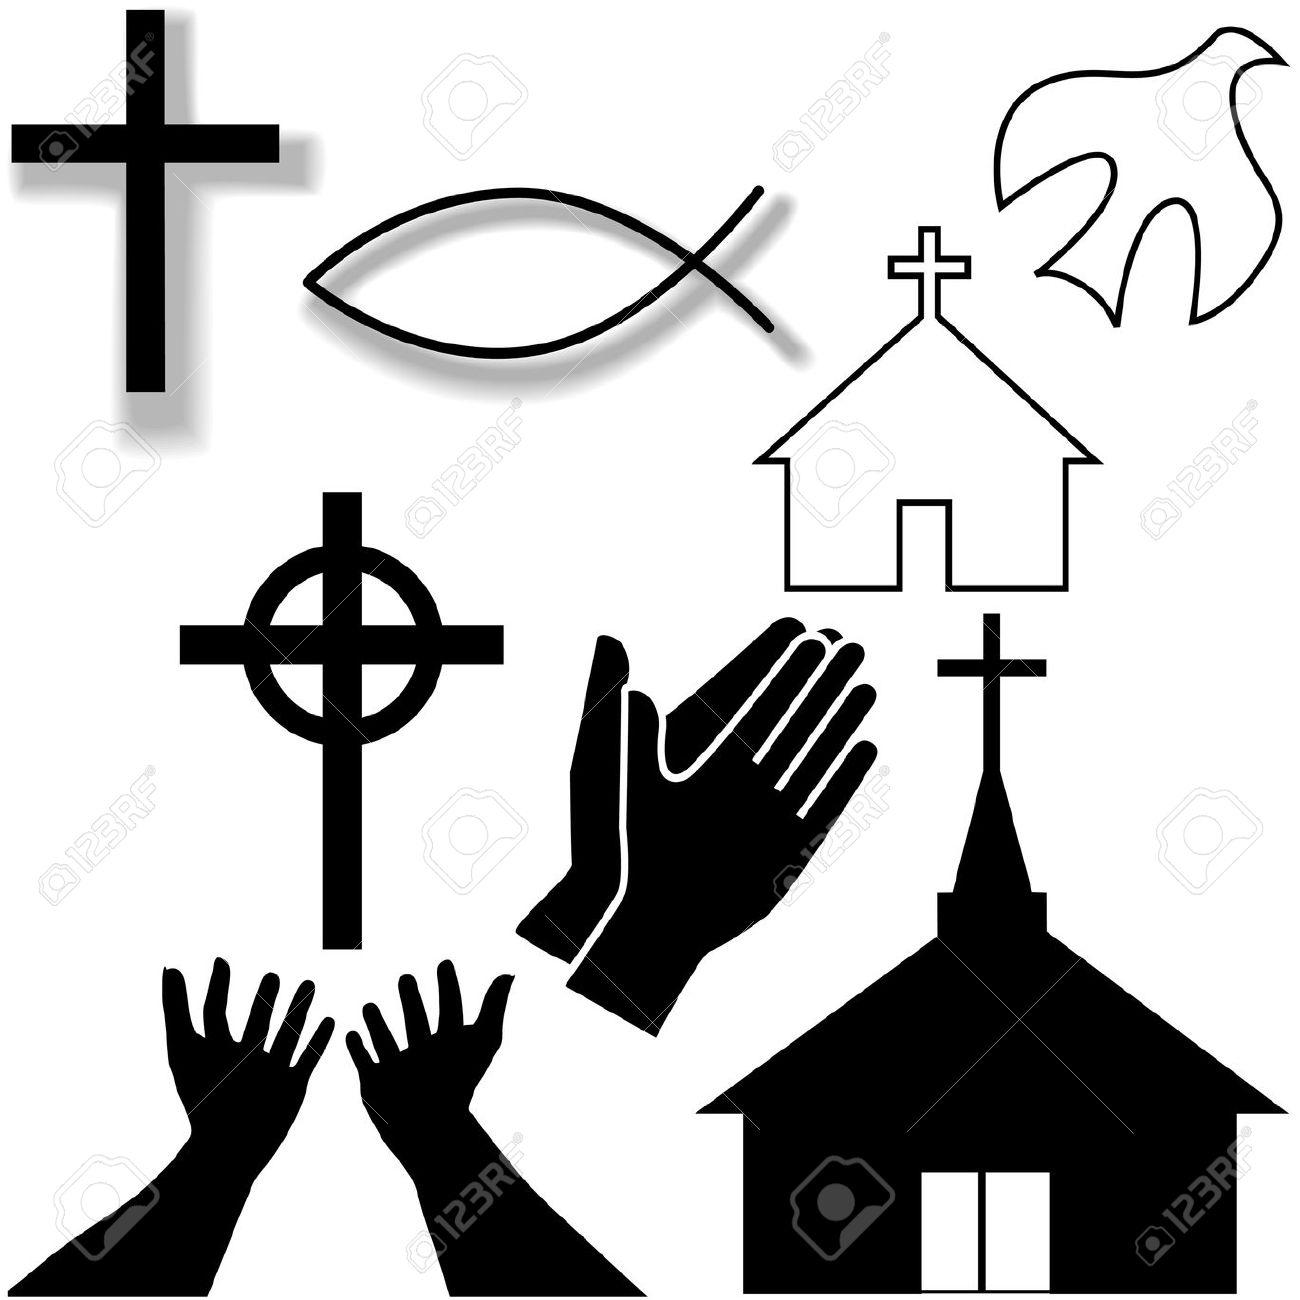 Churches, Crosses, Holy Spirit Dove, Fish Symbol, Hands Praying.